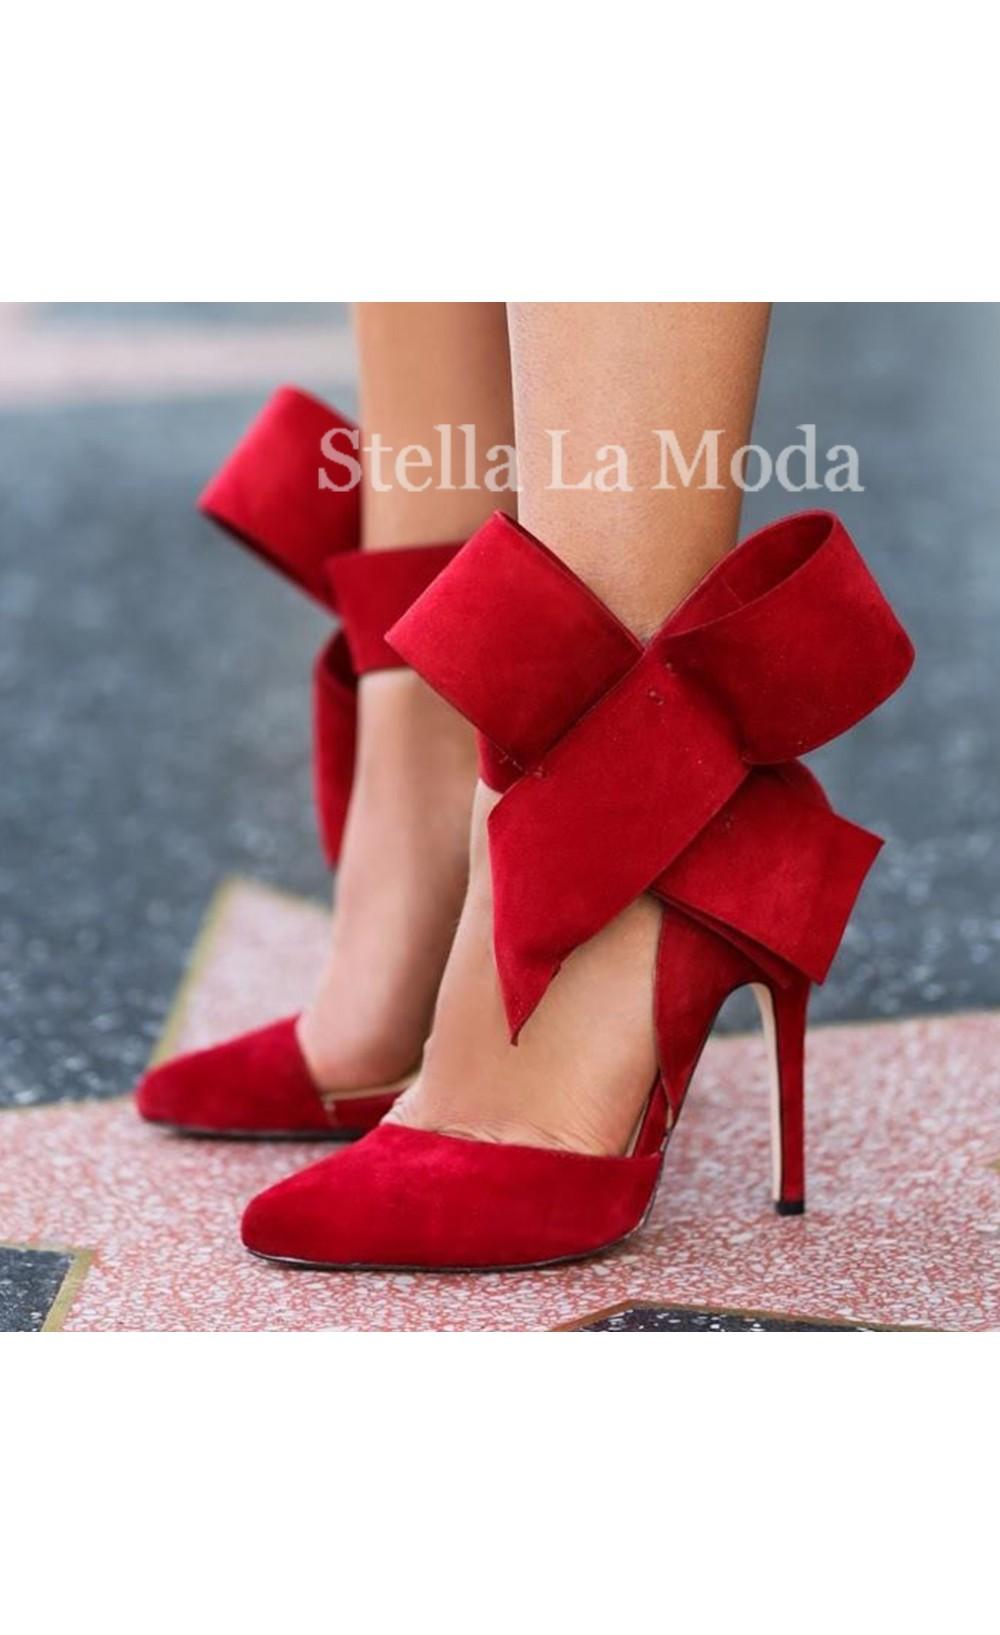 Pointed toe super high stiletto pumps